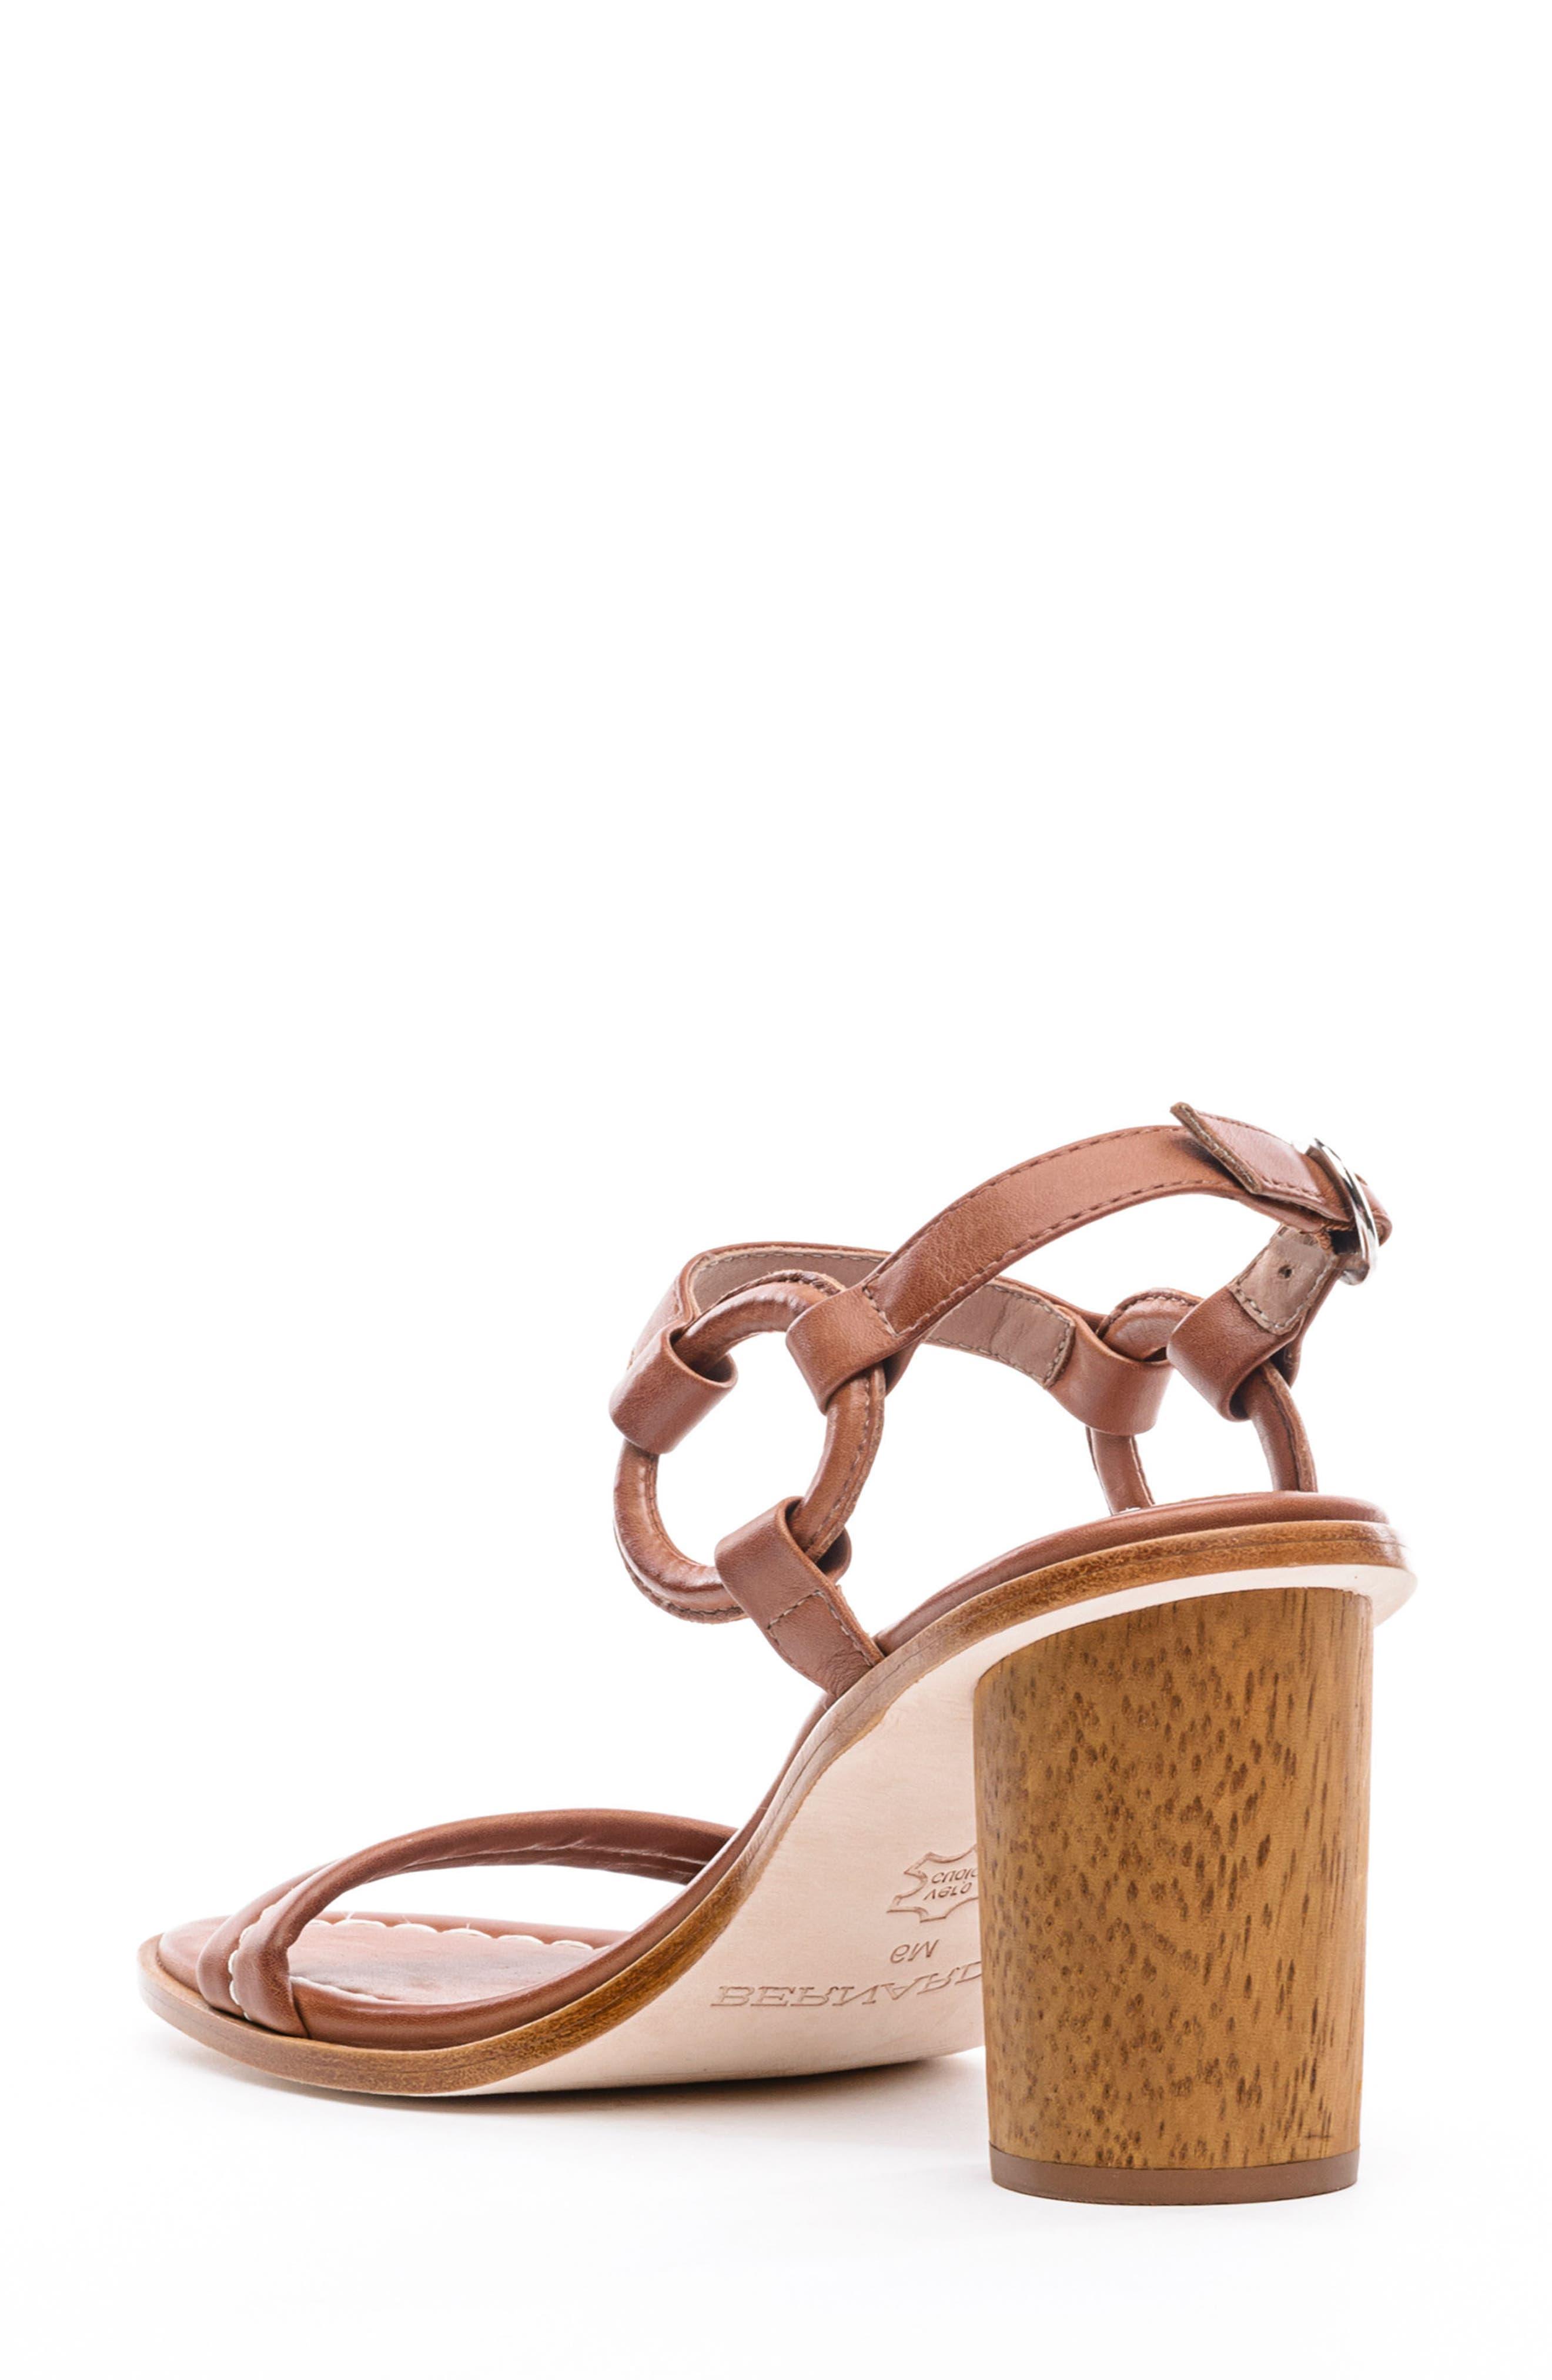 Bernardo Harlow Ankle Strap Sandal,                             Alternate thumbnail 2, color,                             Luggage Leather